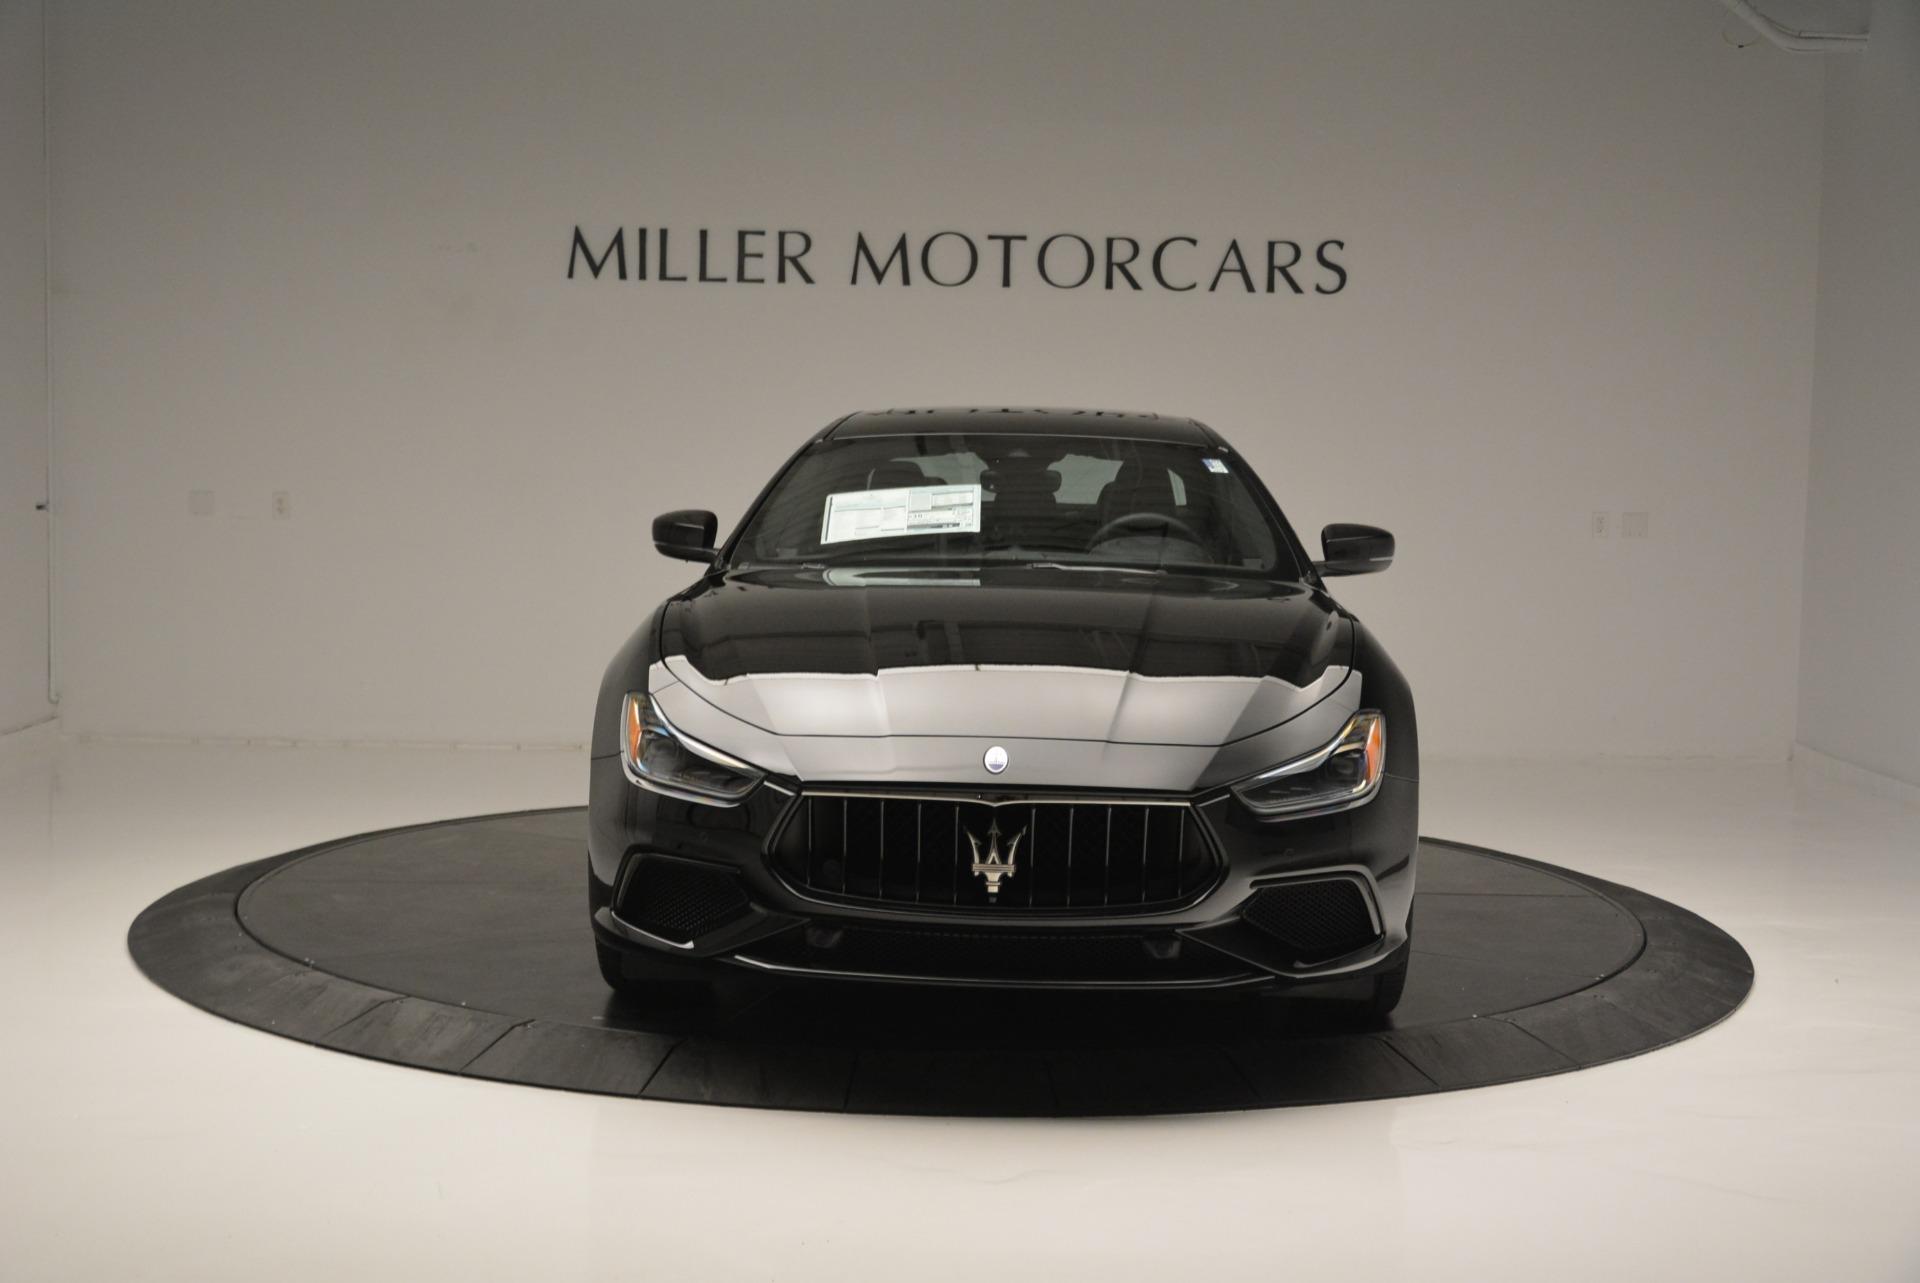 New 2018 Maserati Ghibli SQ4 GranSport Nerissimo For Sale In Westport, CT 2366_p12